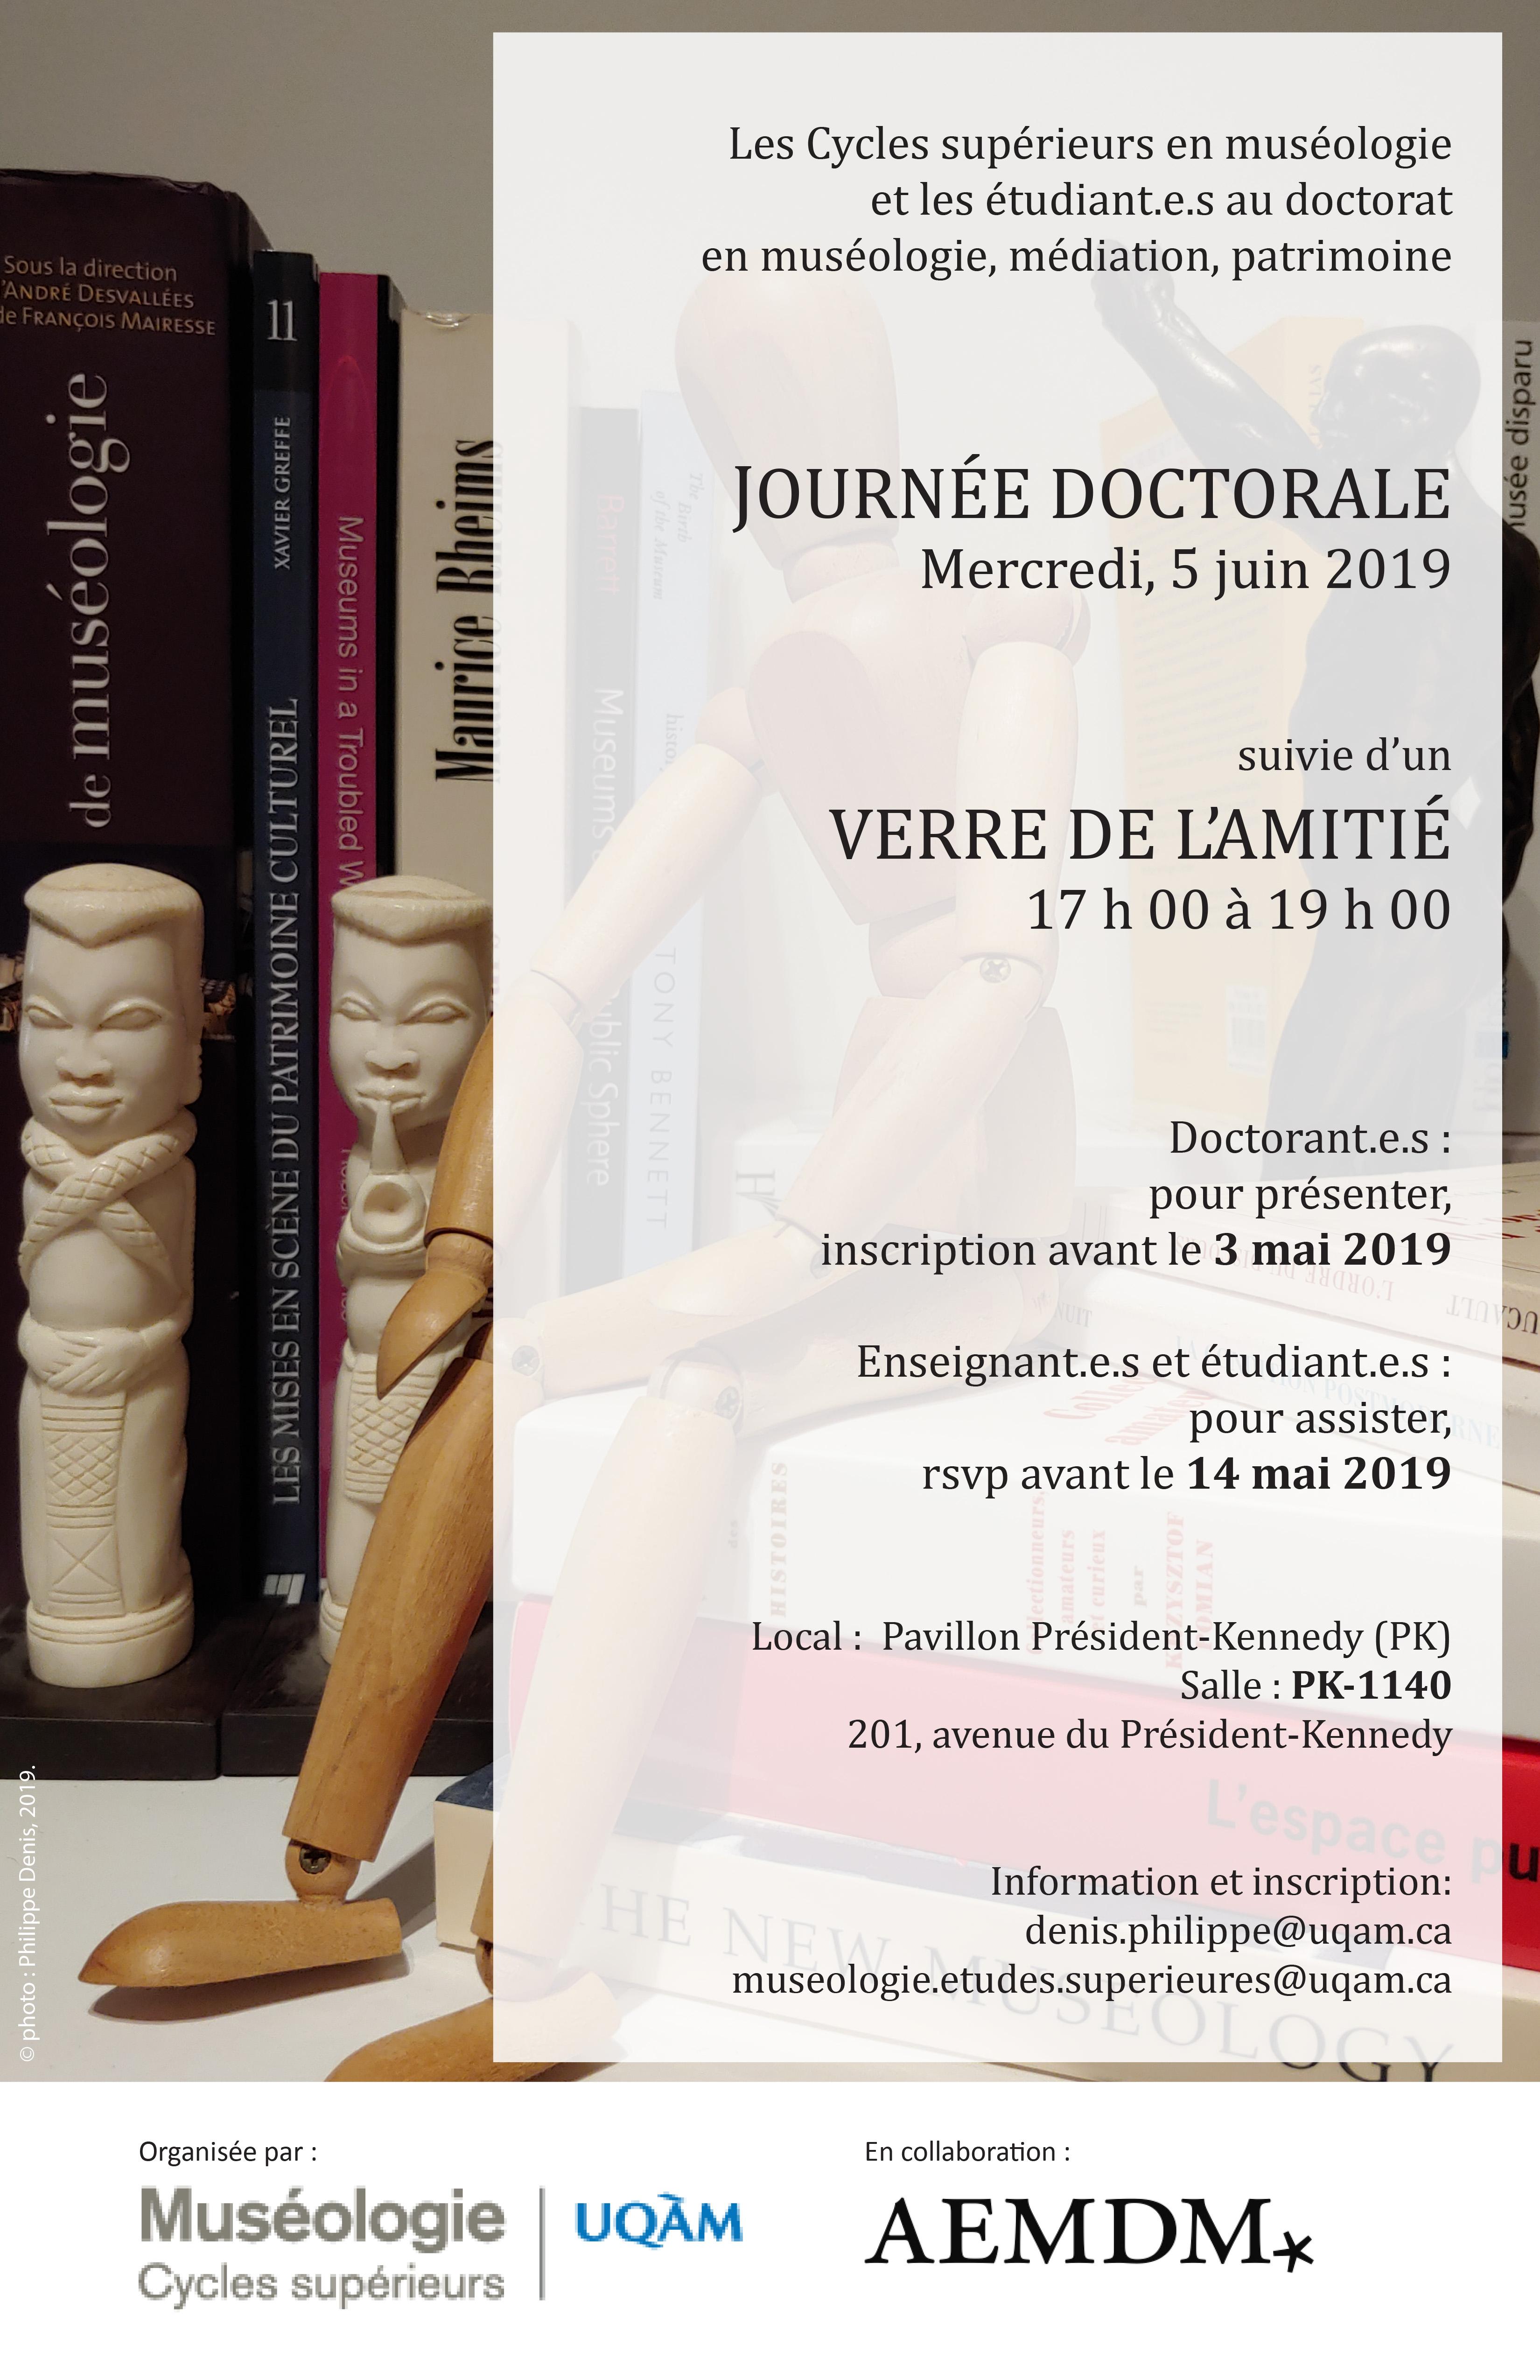 Journée doctorale en muséologie